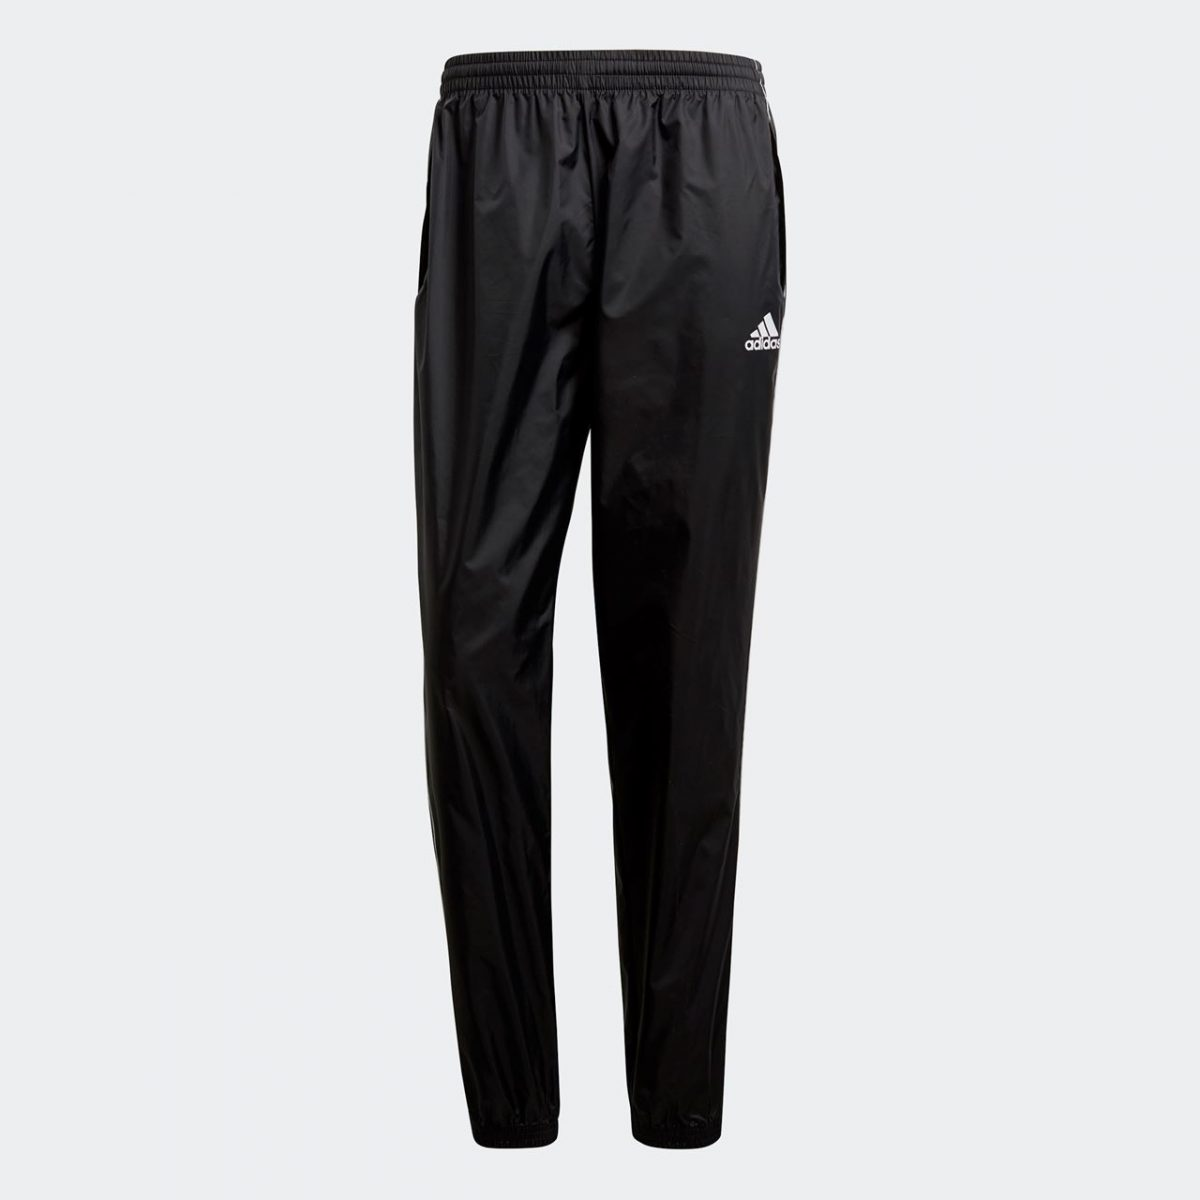 Adidas Core 18 Rain Pant Adult